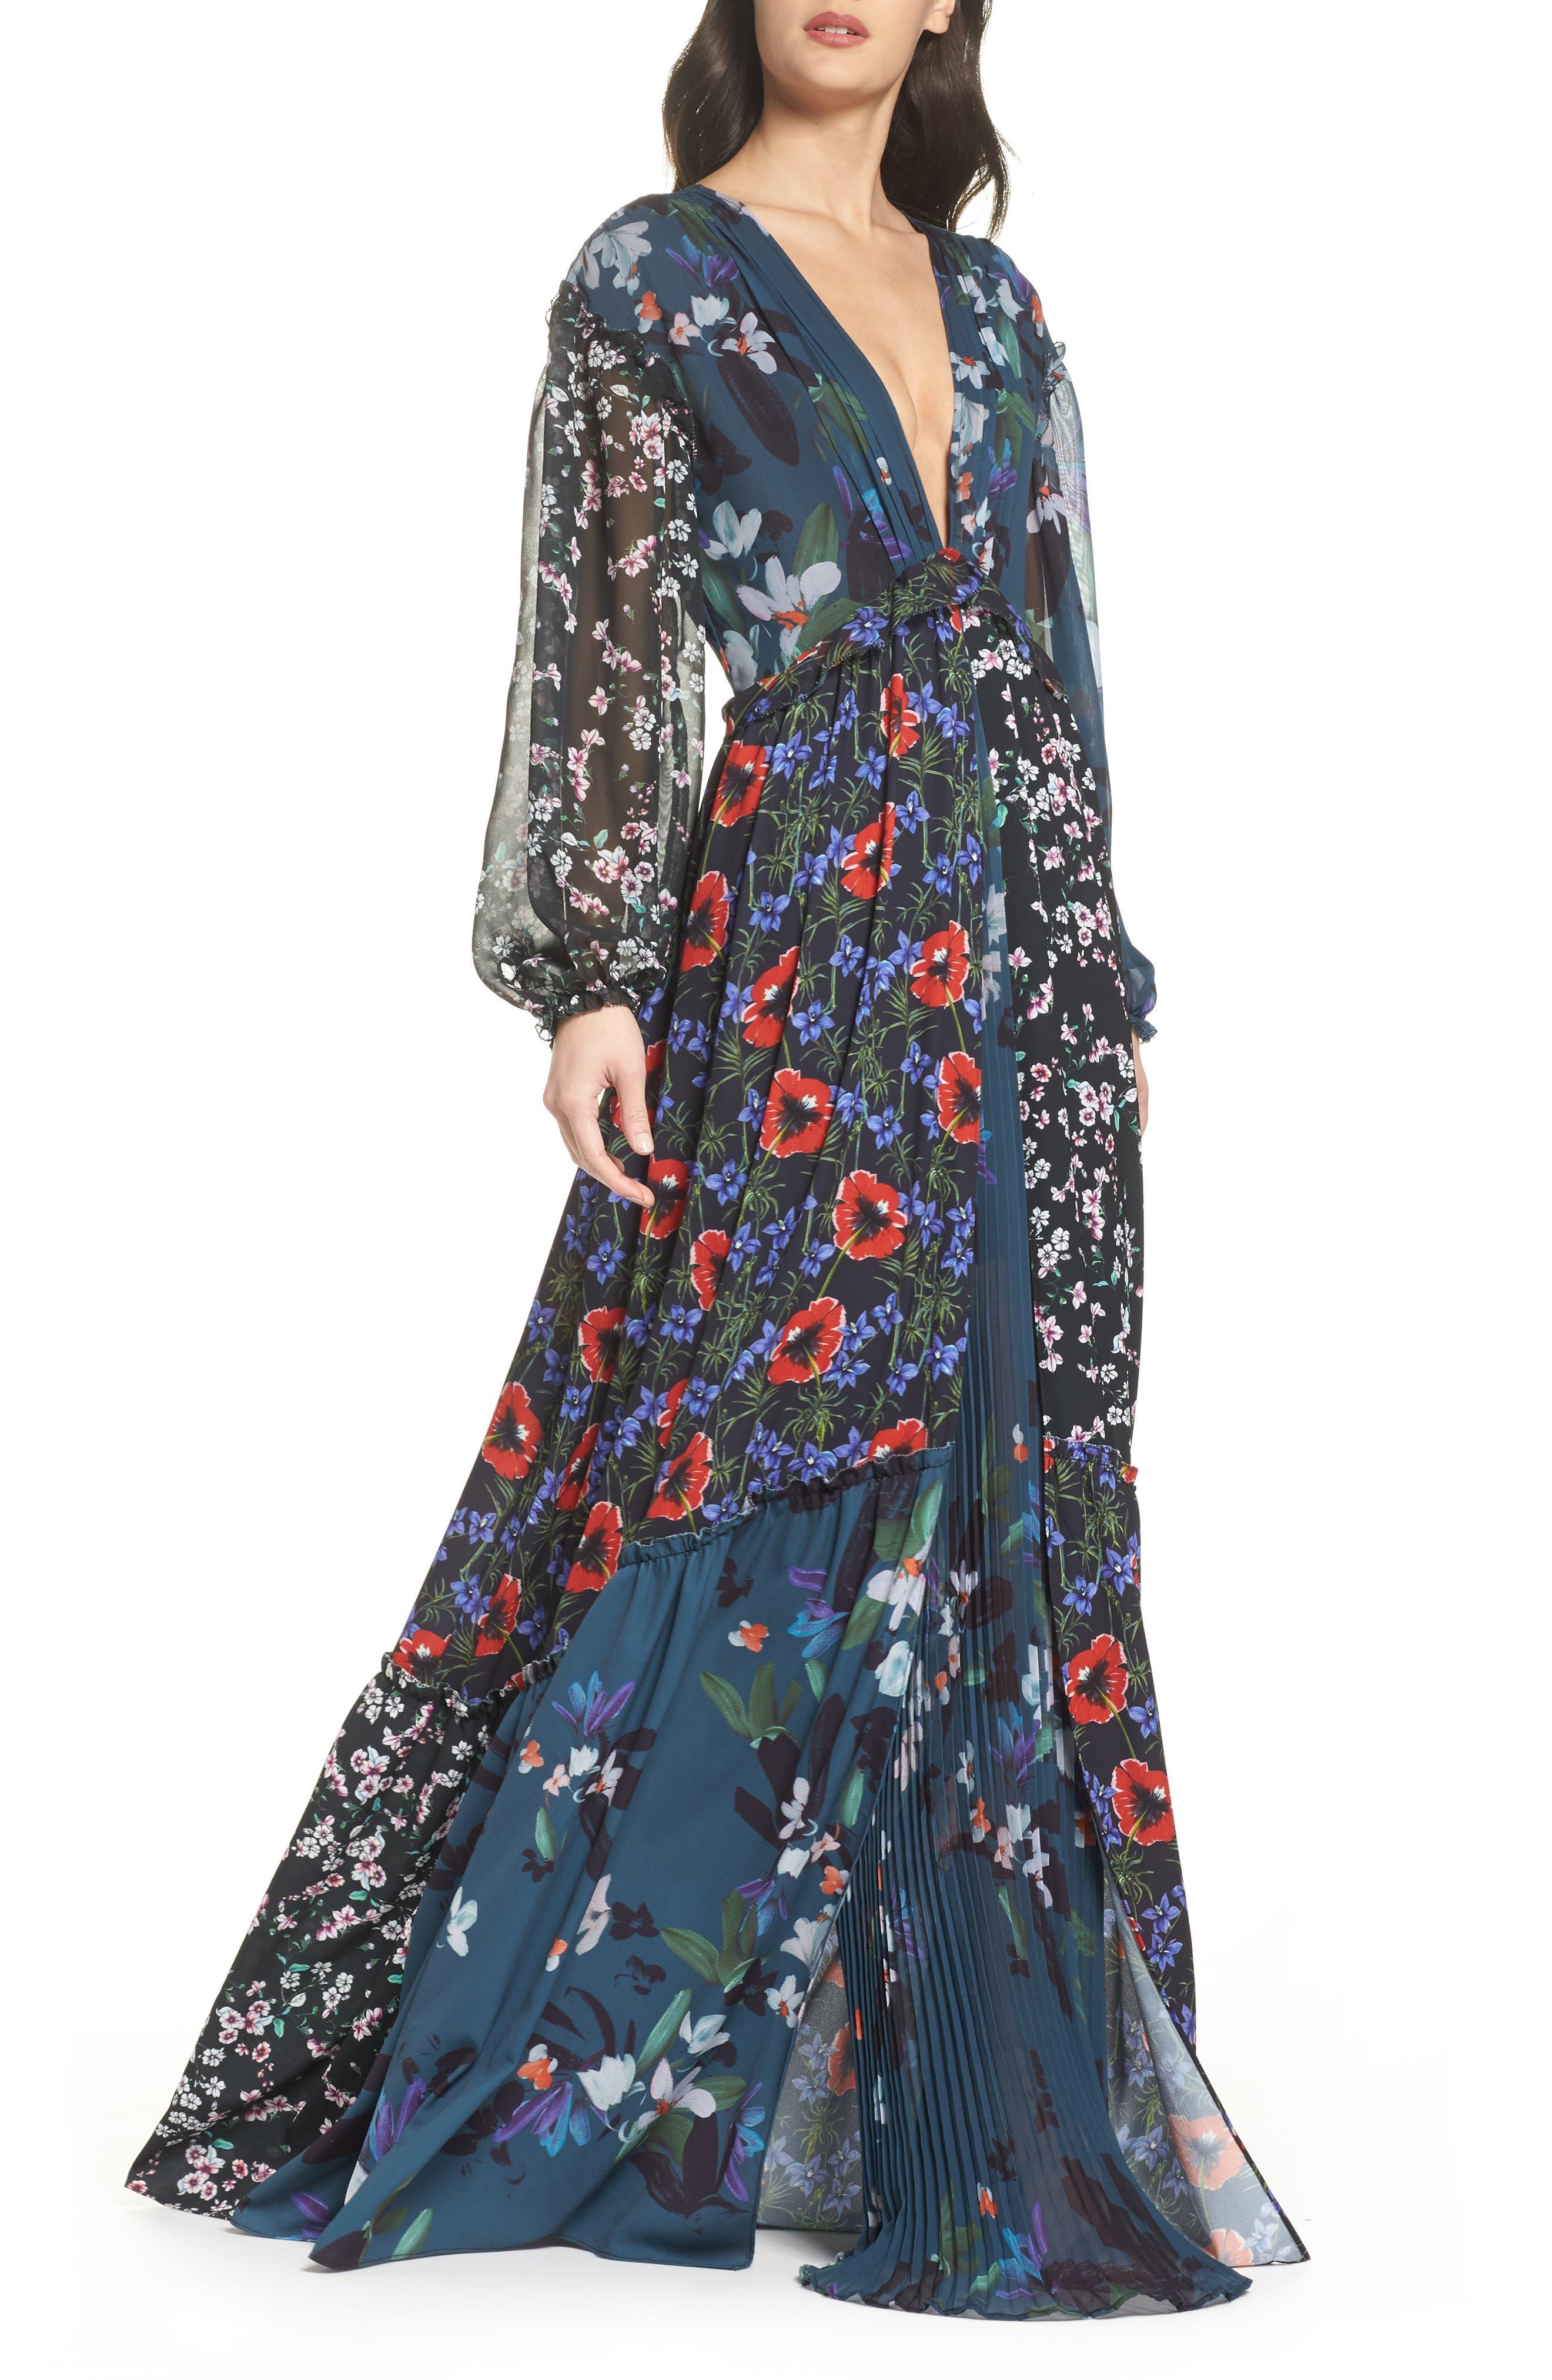 Celia Mix Floral Maxi Dress,                             Main thumbnail 1, color,                             451